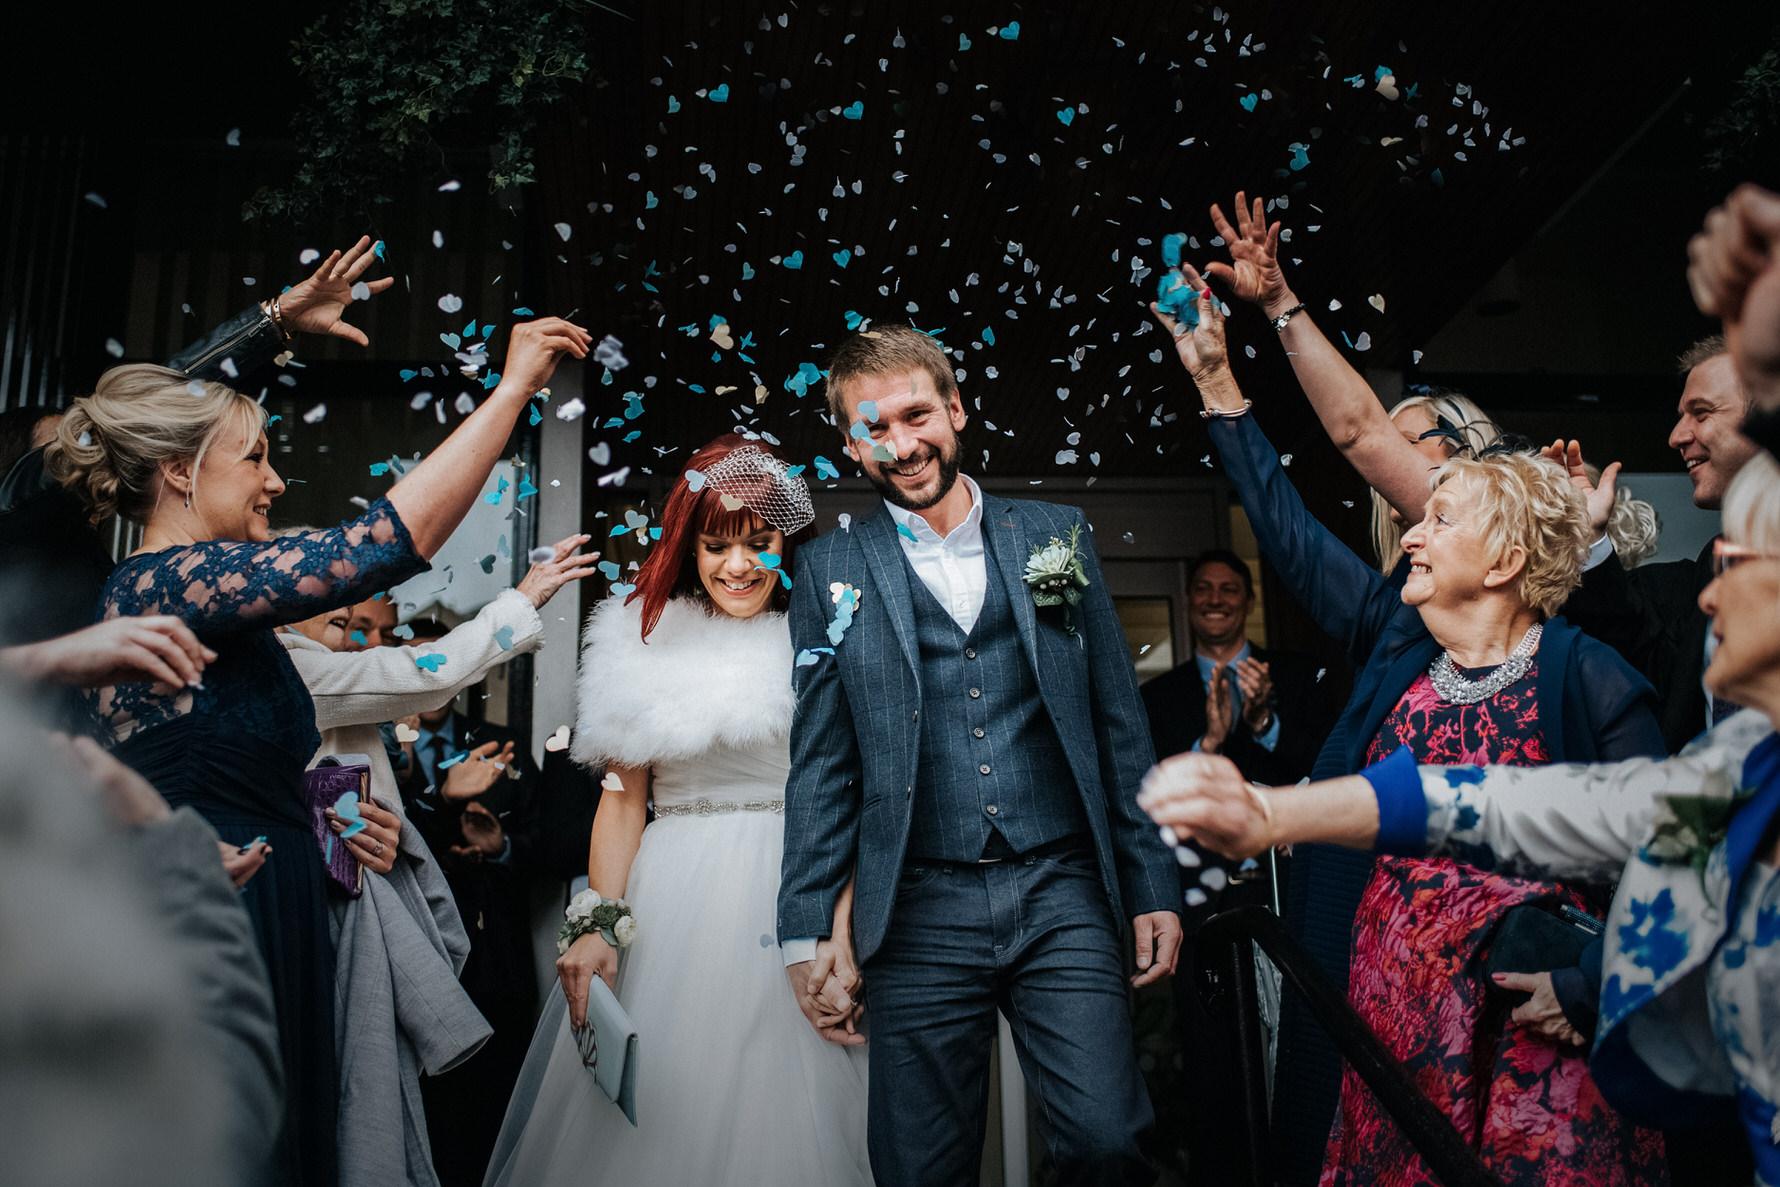 Cheshire Wedding Photojournalism - the confetti shot